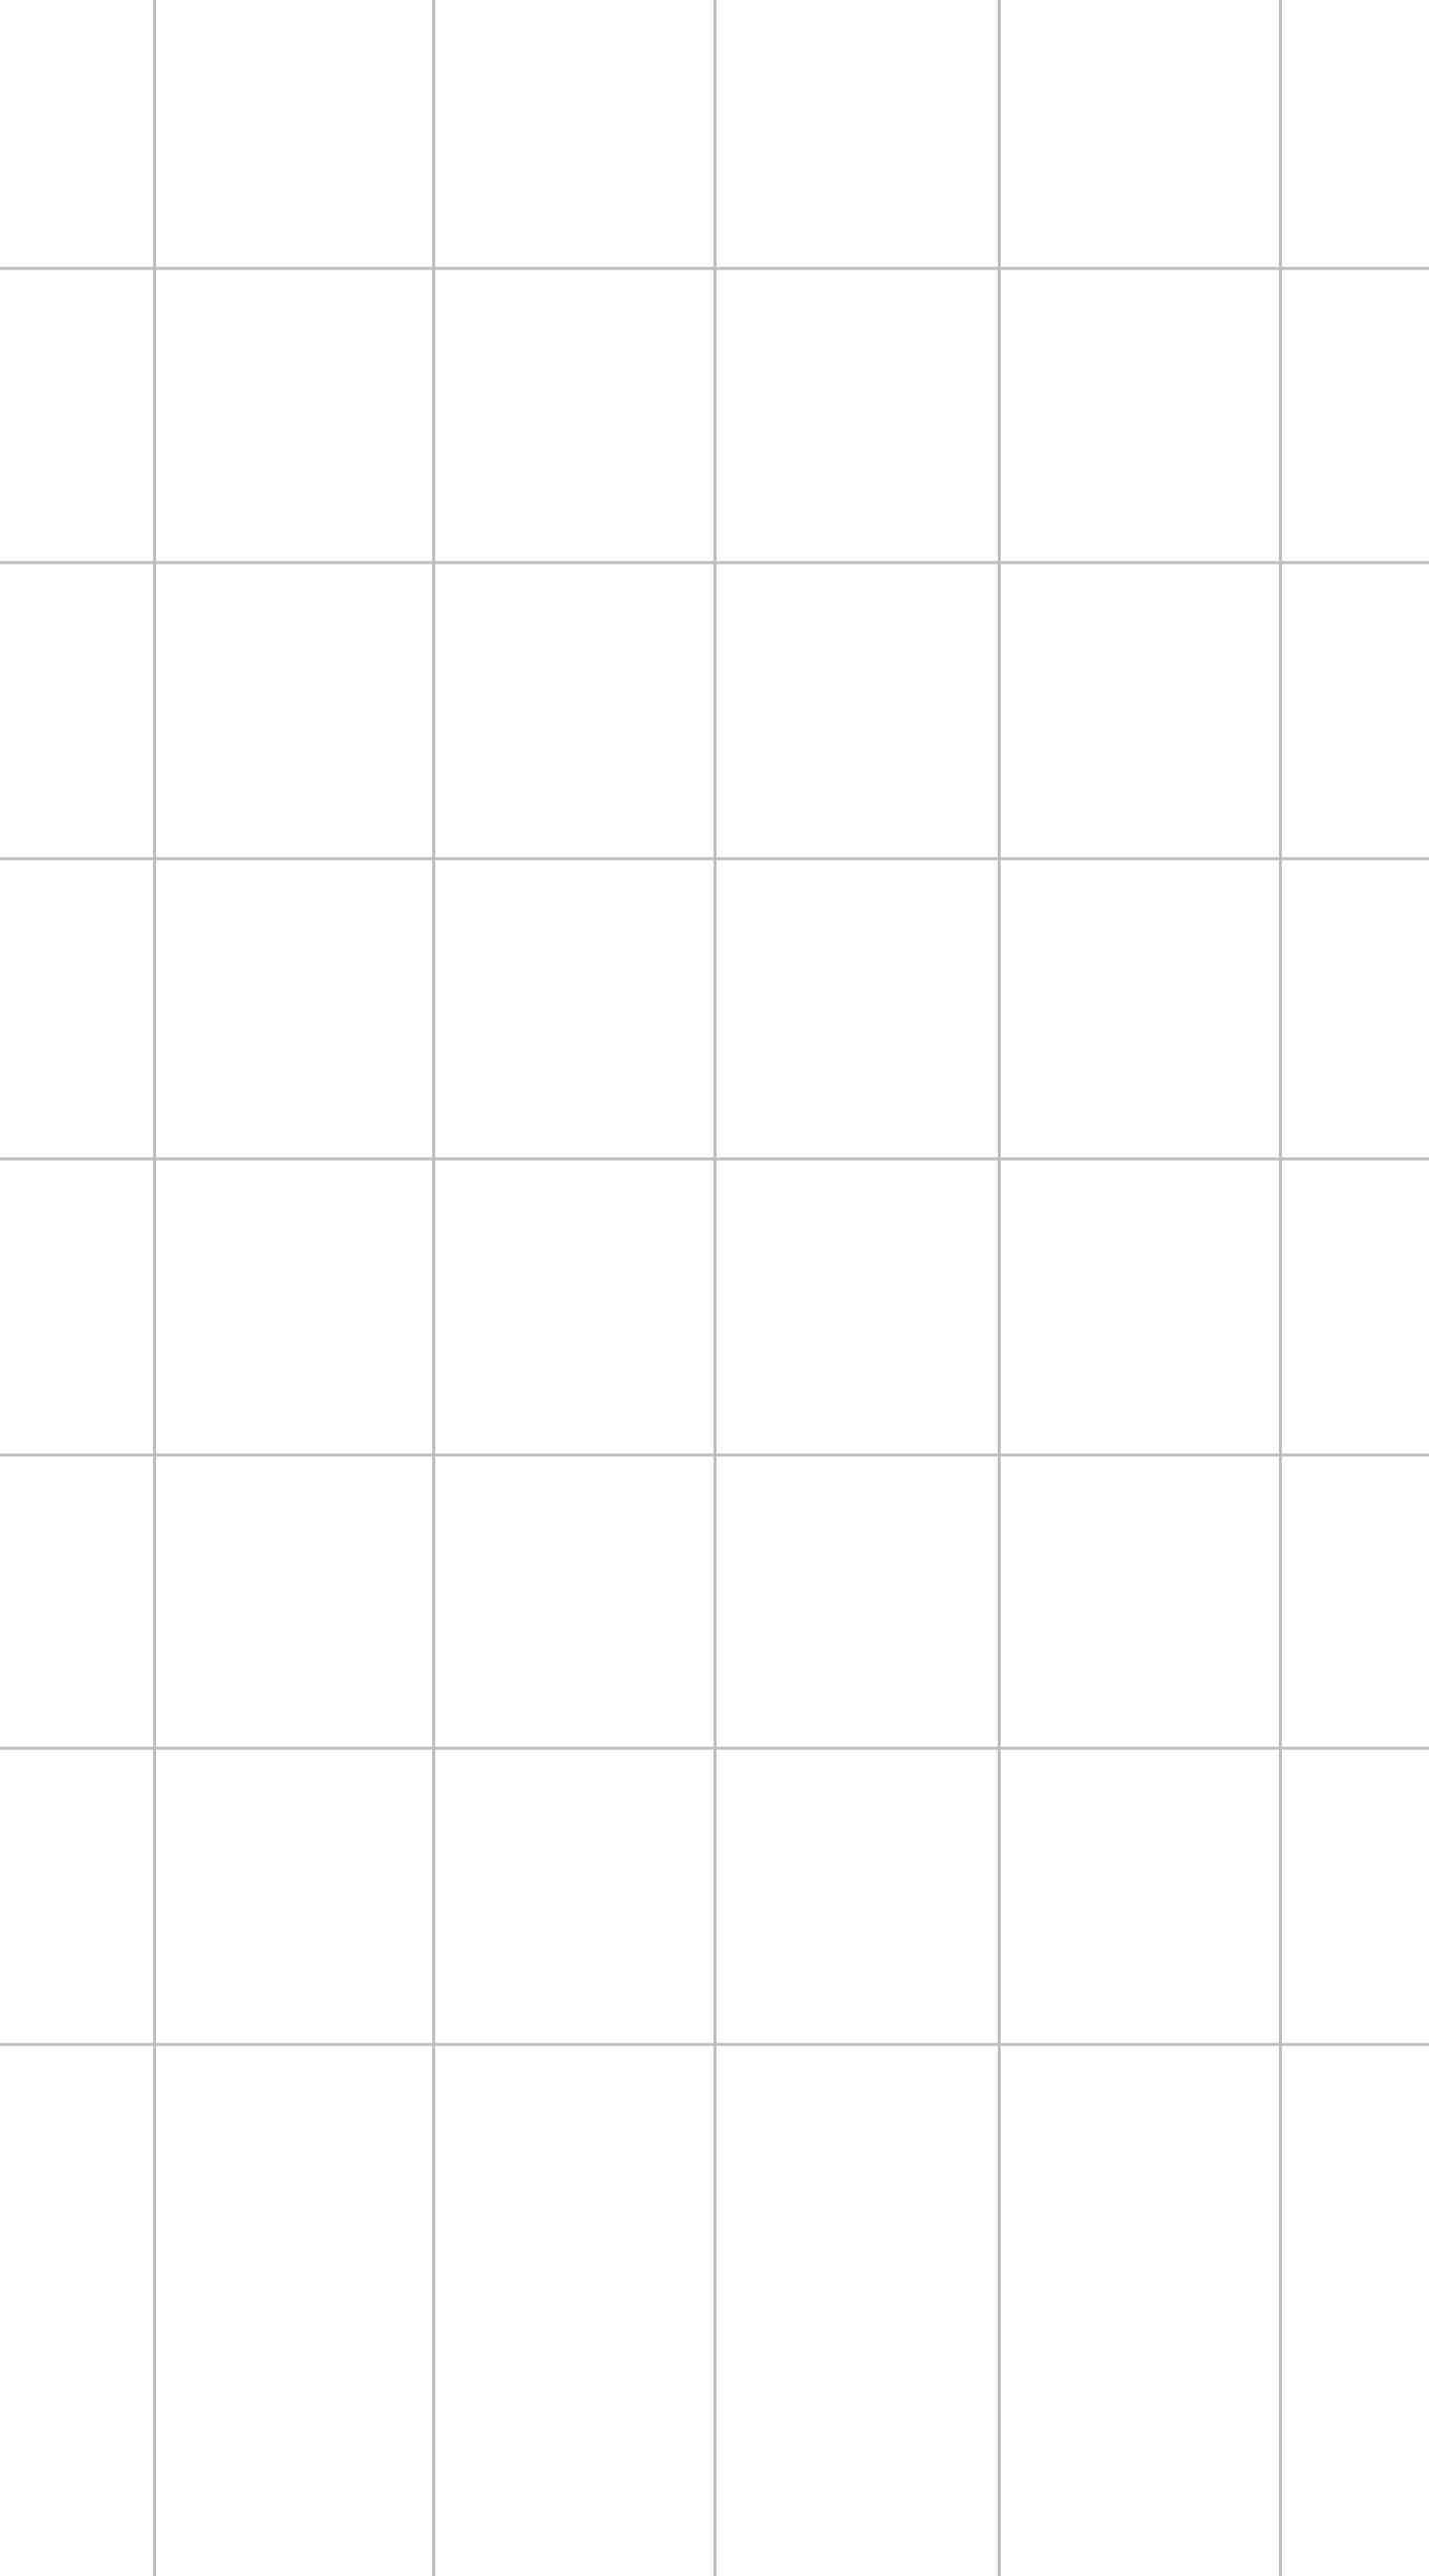 Shelf Black And White Borders Wallpapersc Iphone6splus